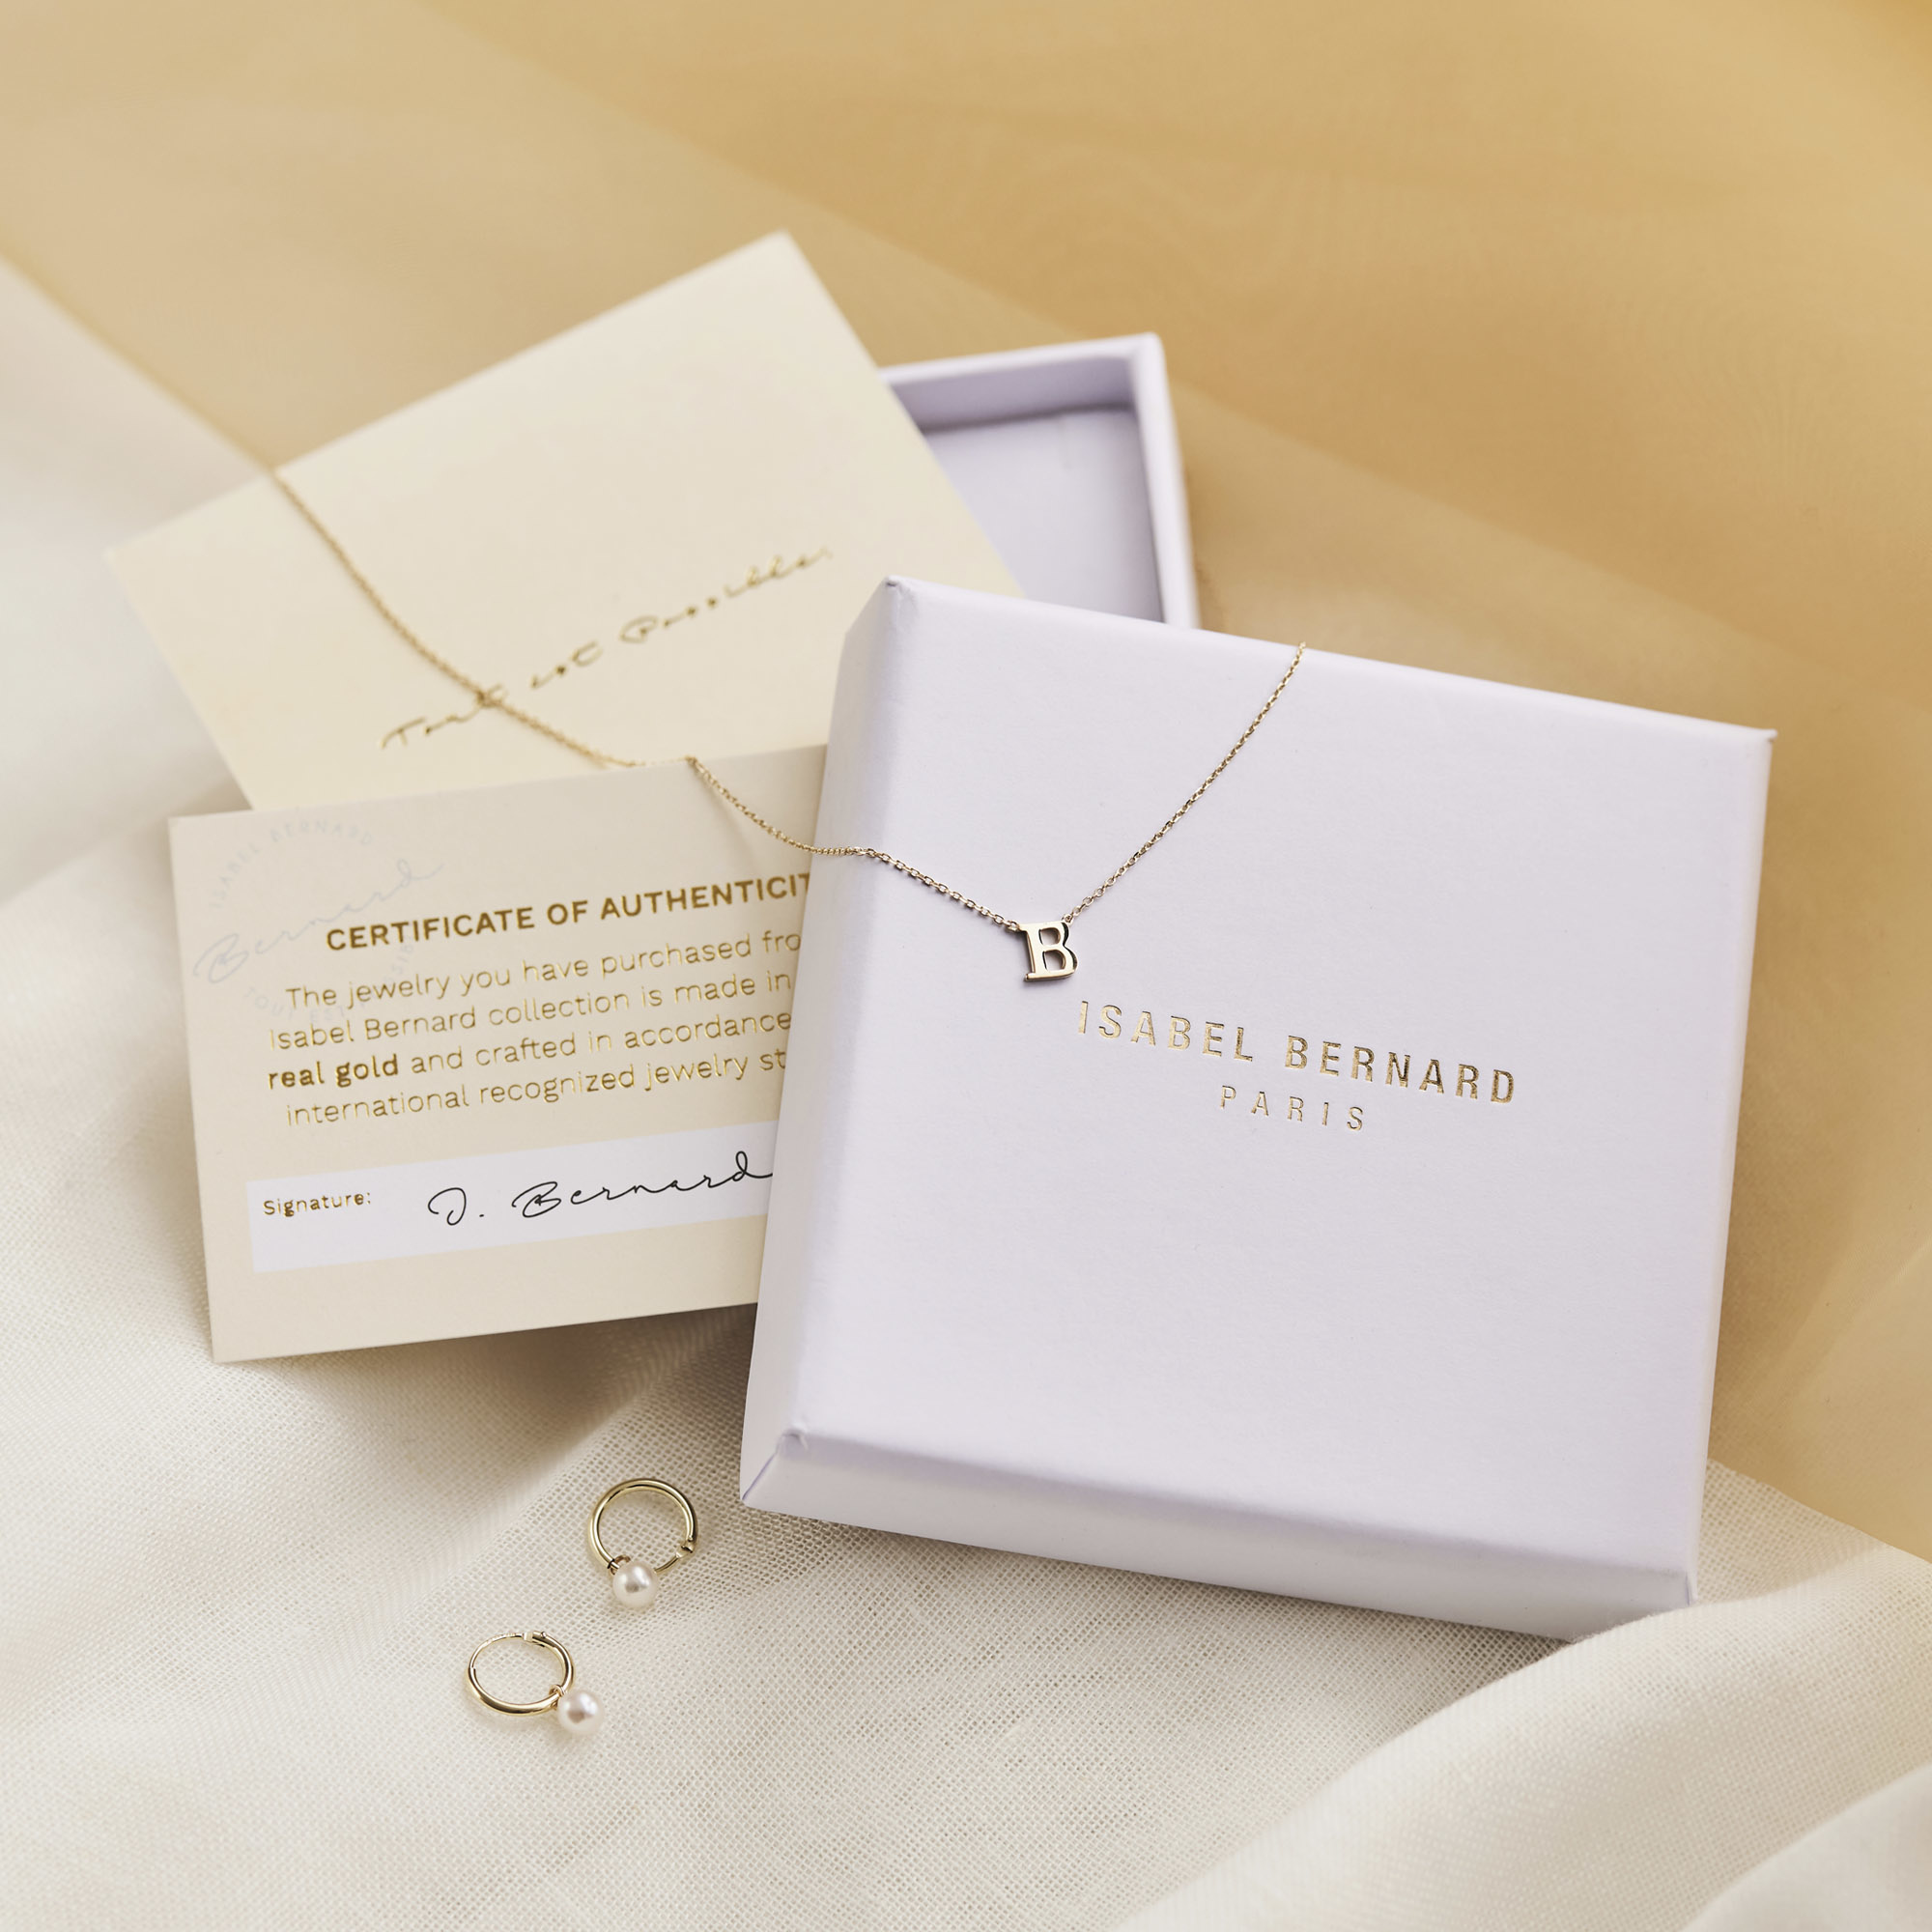 Isabel Bernard Saint Germain Finou orecchini a bottone in oro bianco 14 carati